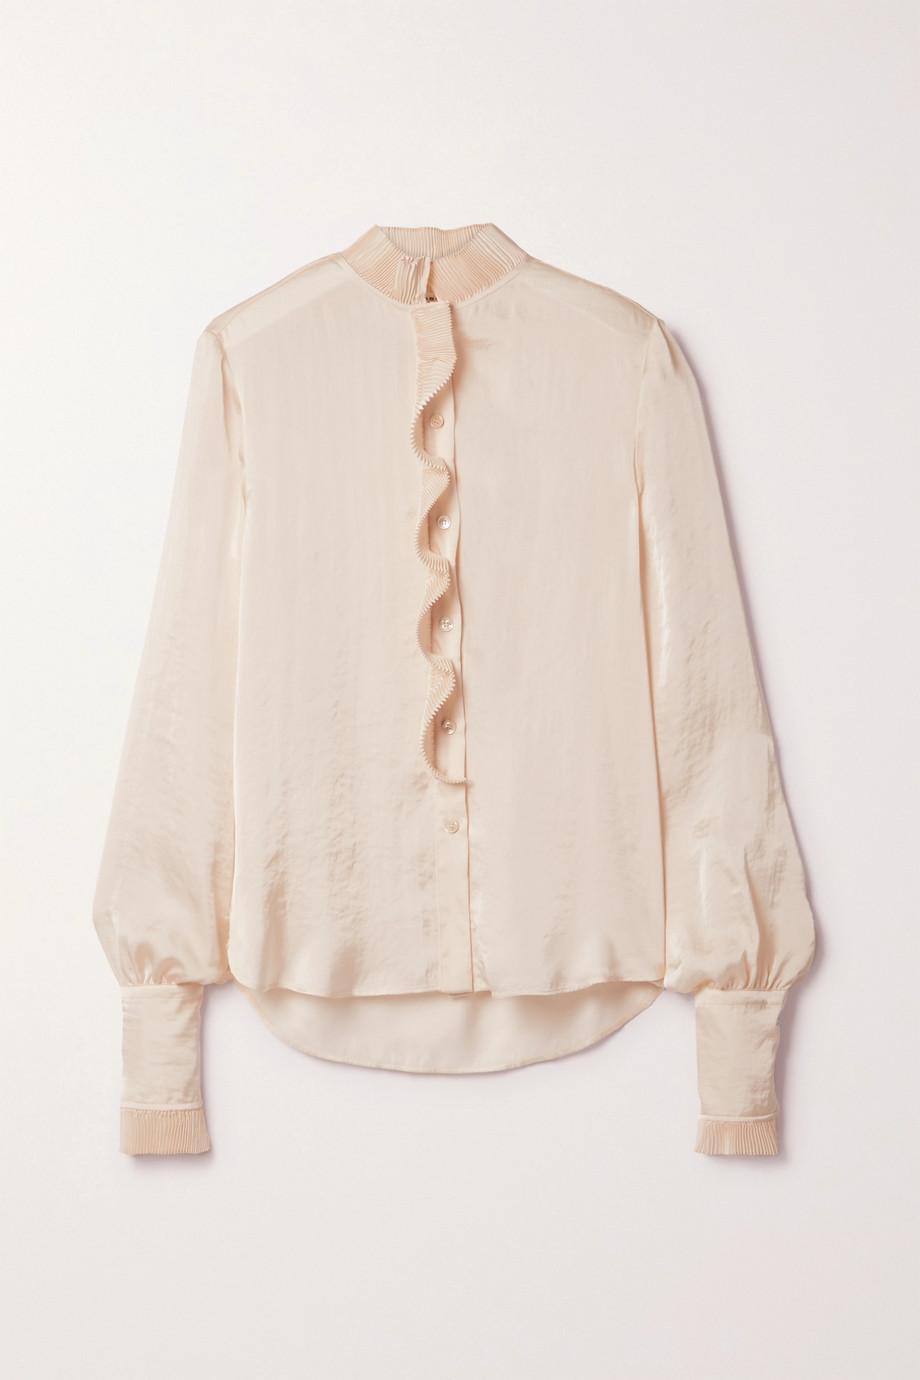 Philosophy di Lorenzo Serafini Plissé ruffled hammered-satin blouse